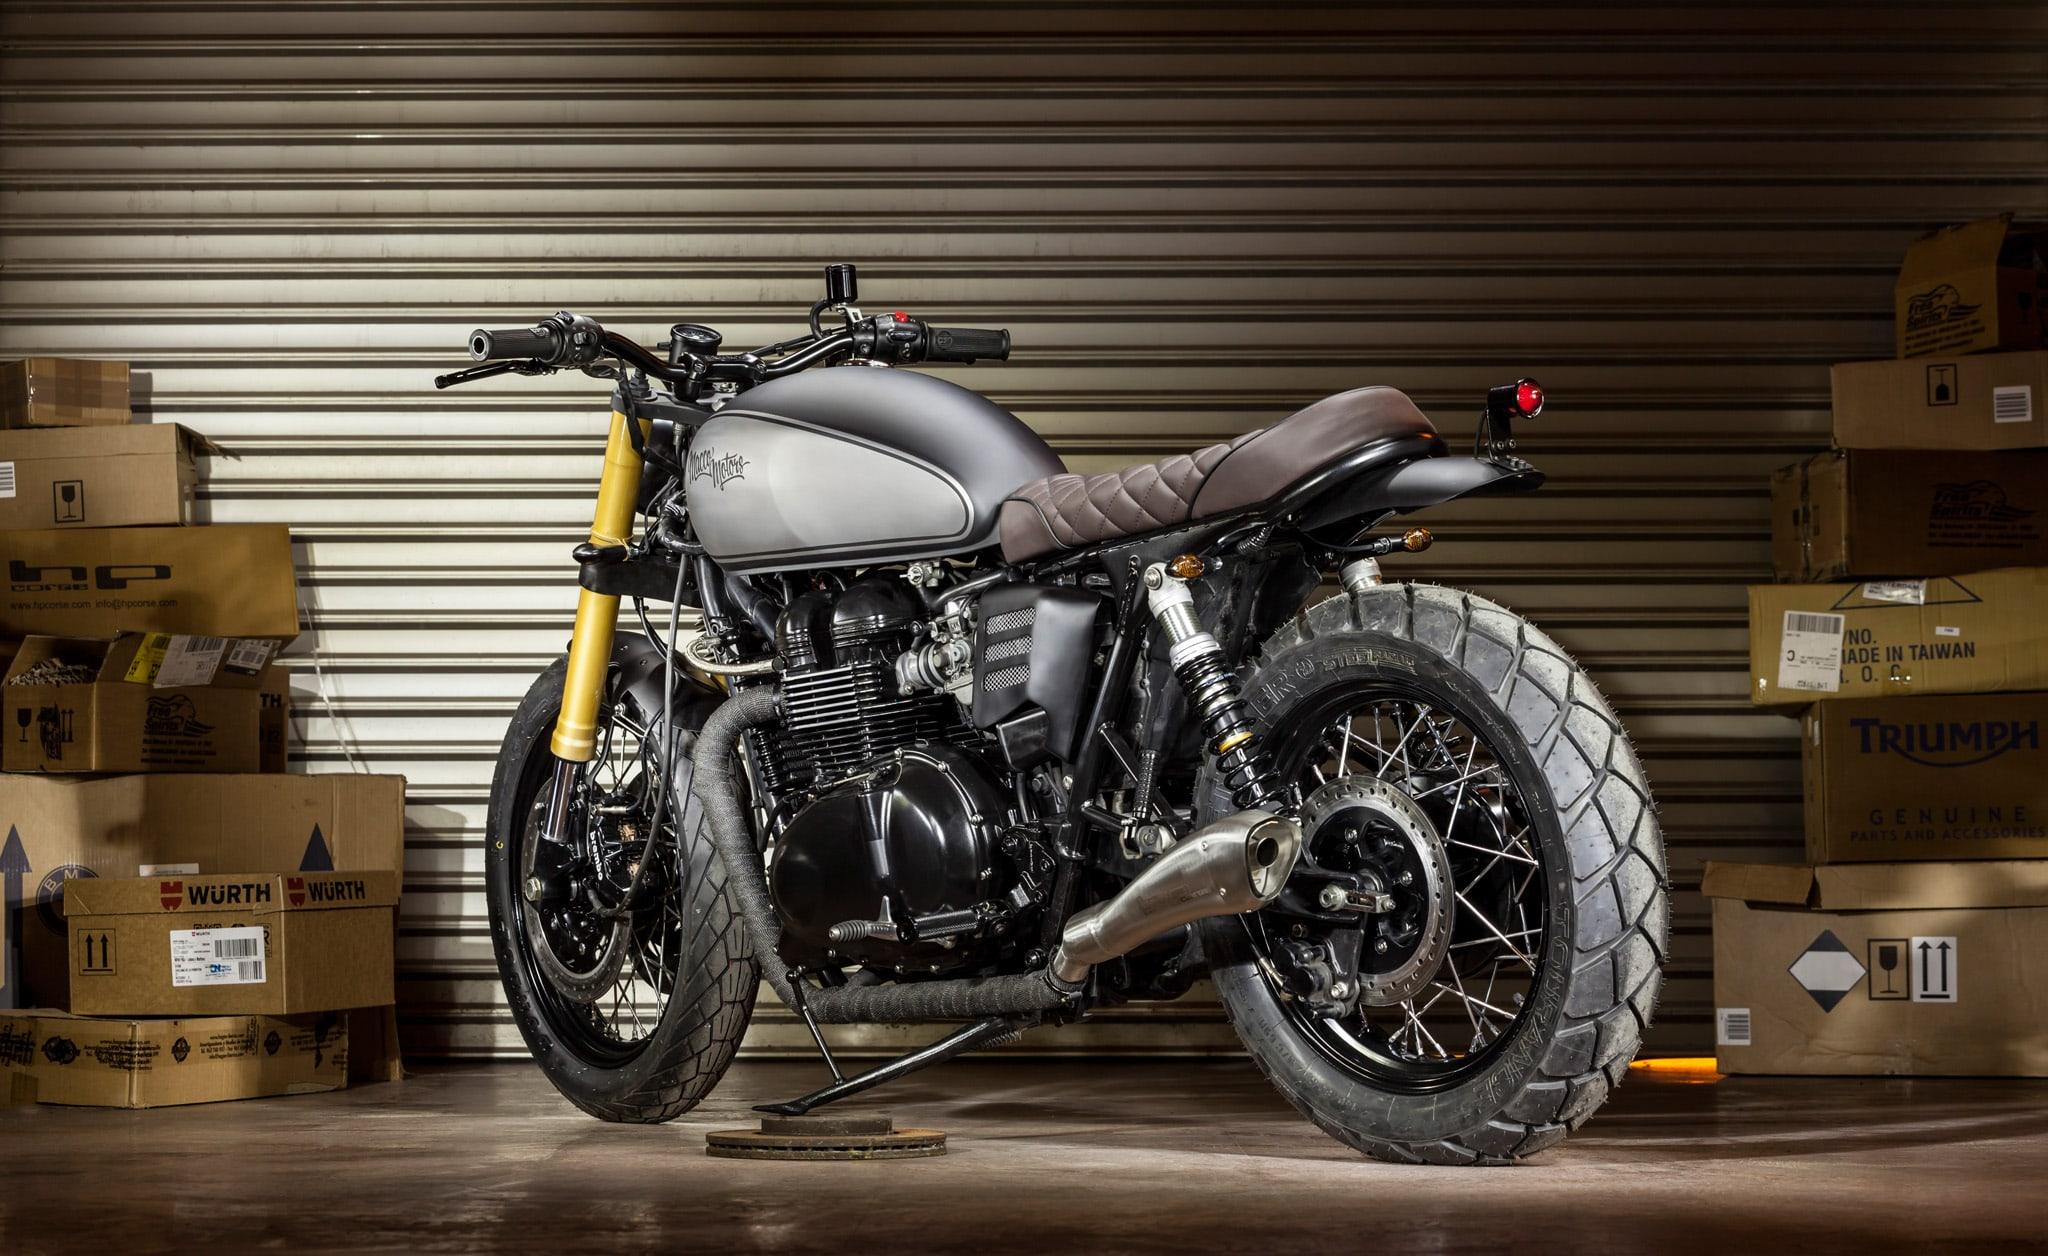 Triumph-Bonneville-The-Maltese-Falcon-Moto-Macco-Motors-Effronté-05-min